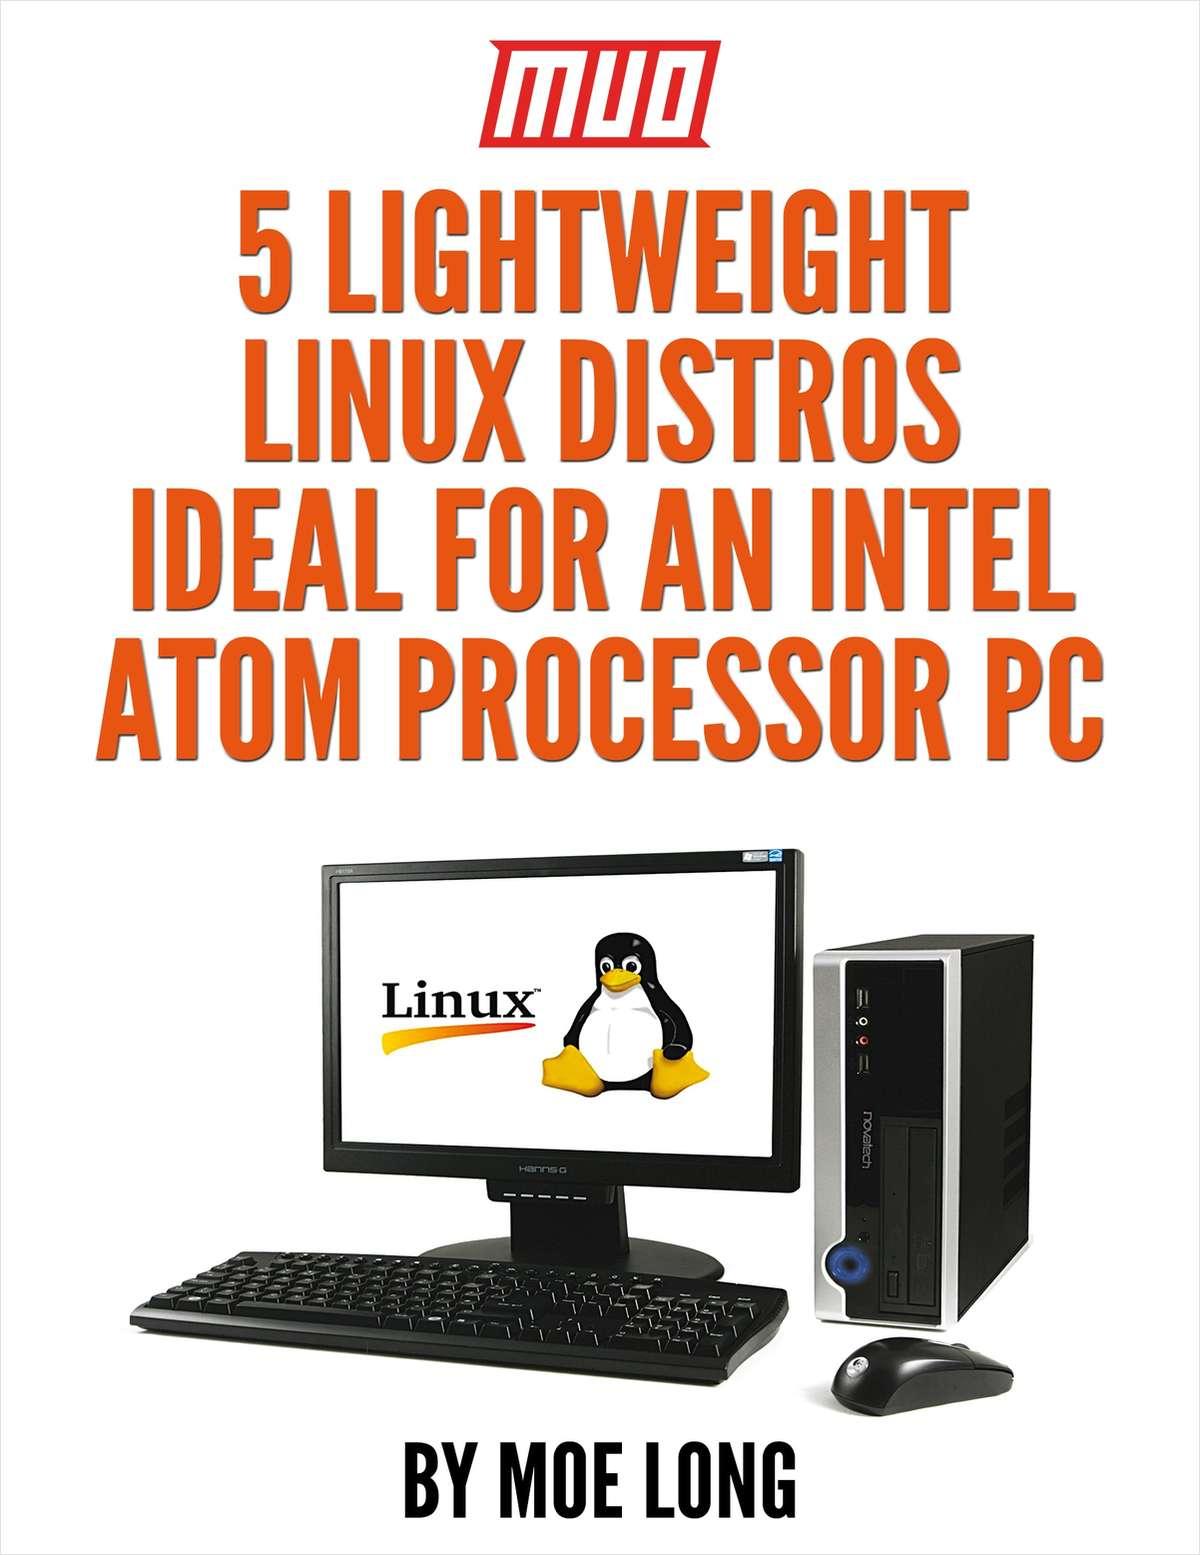 5 Lightweight Linux Distros Ideal for an Intel Atom Processor PC